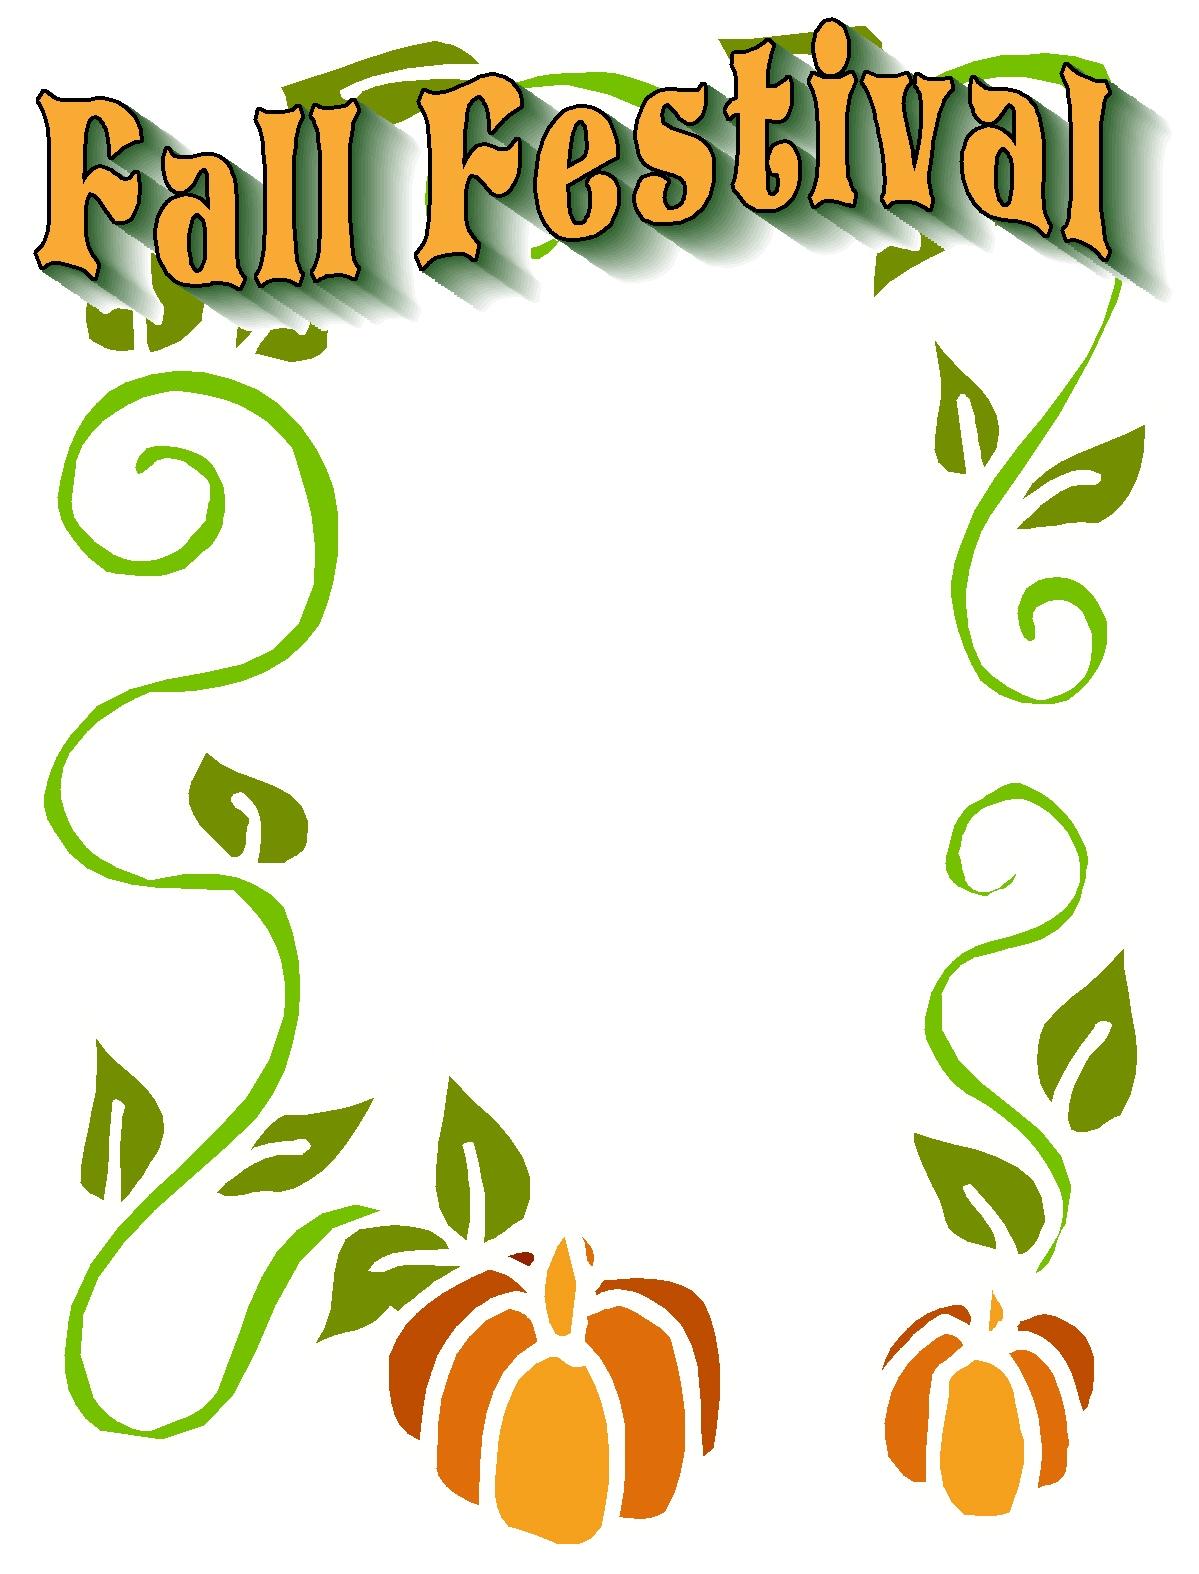 Fall festival clip art free.